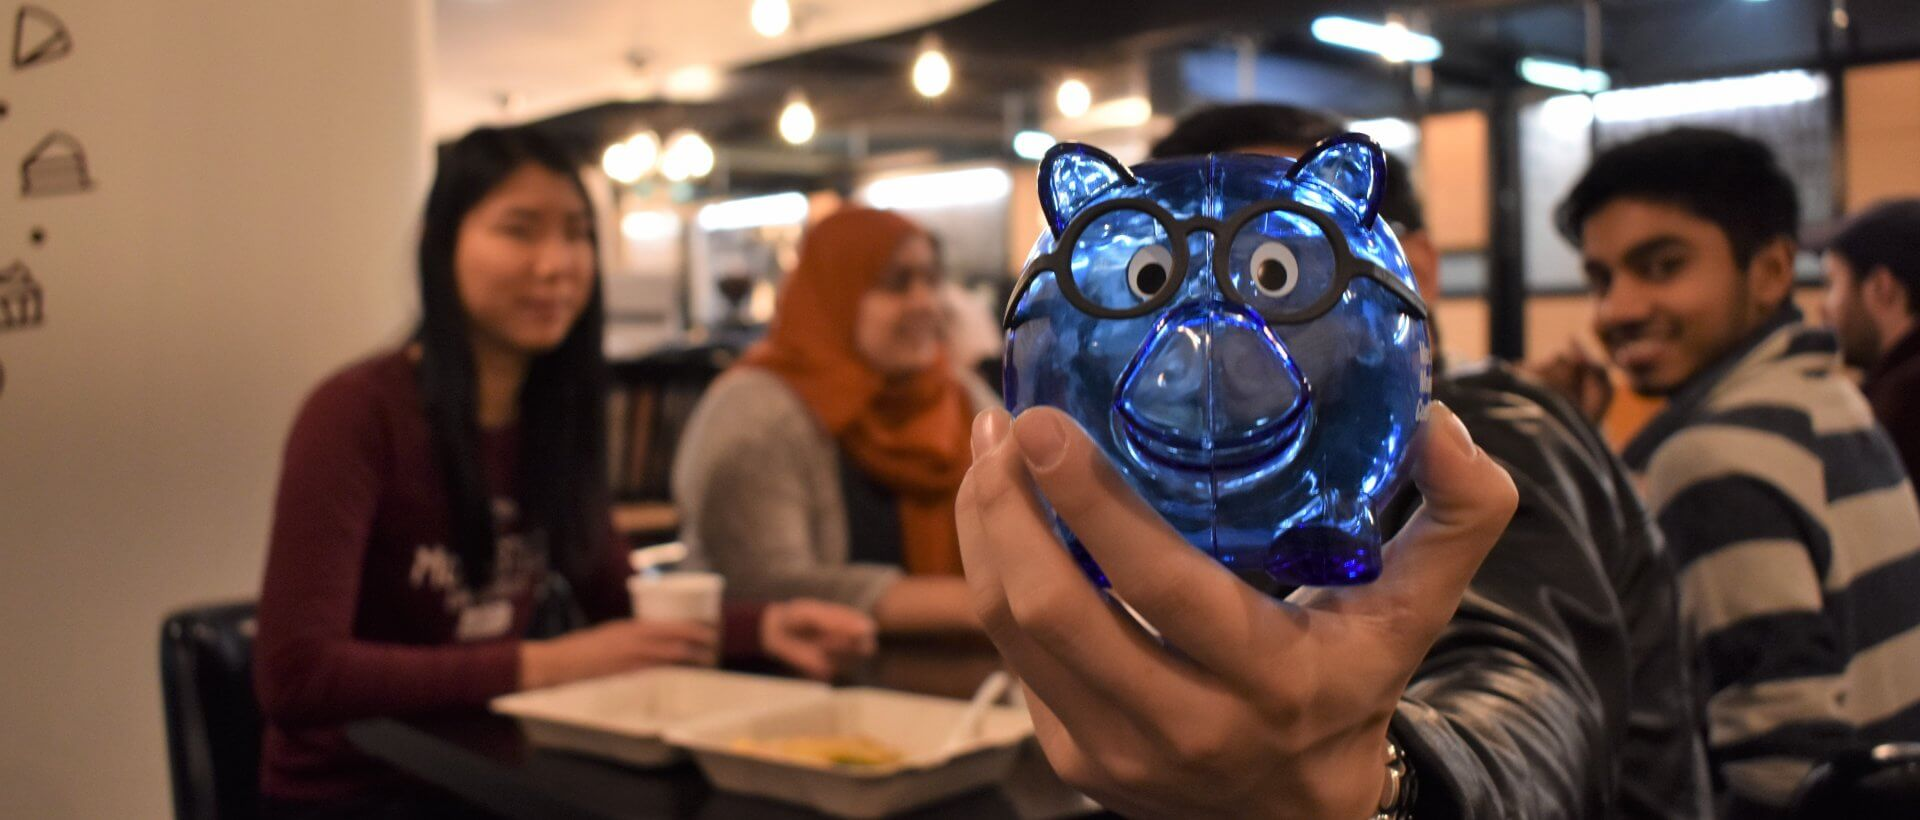 Student holding up a blue plastic piggy bank